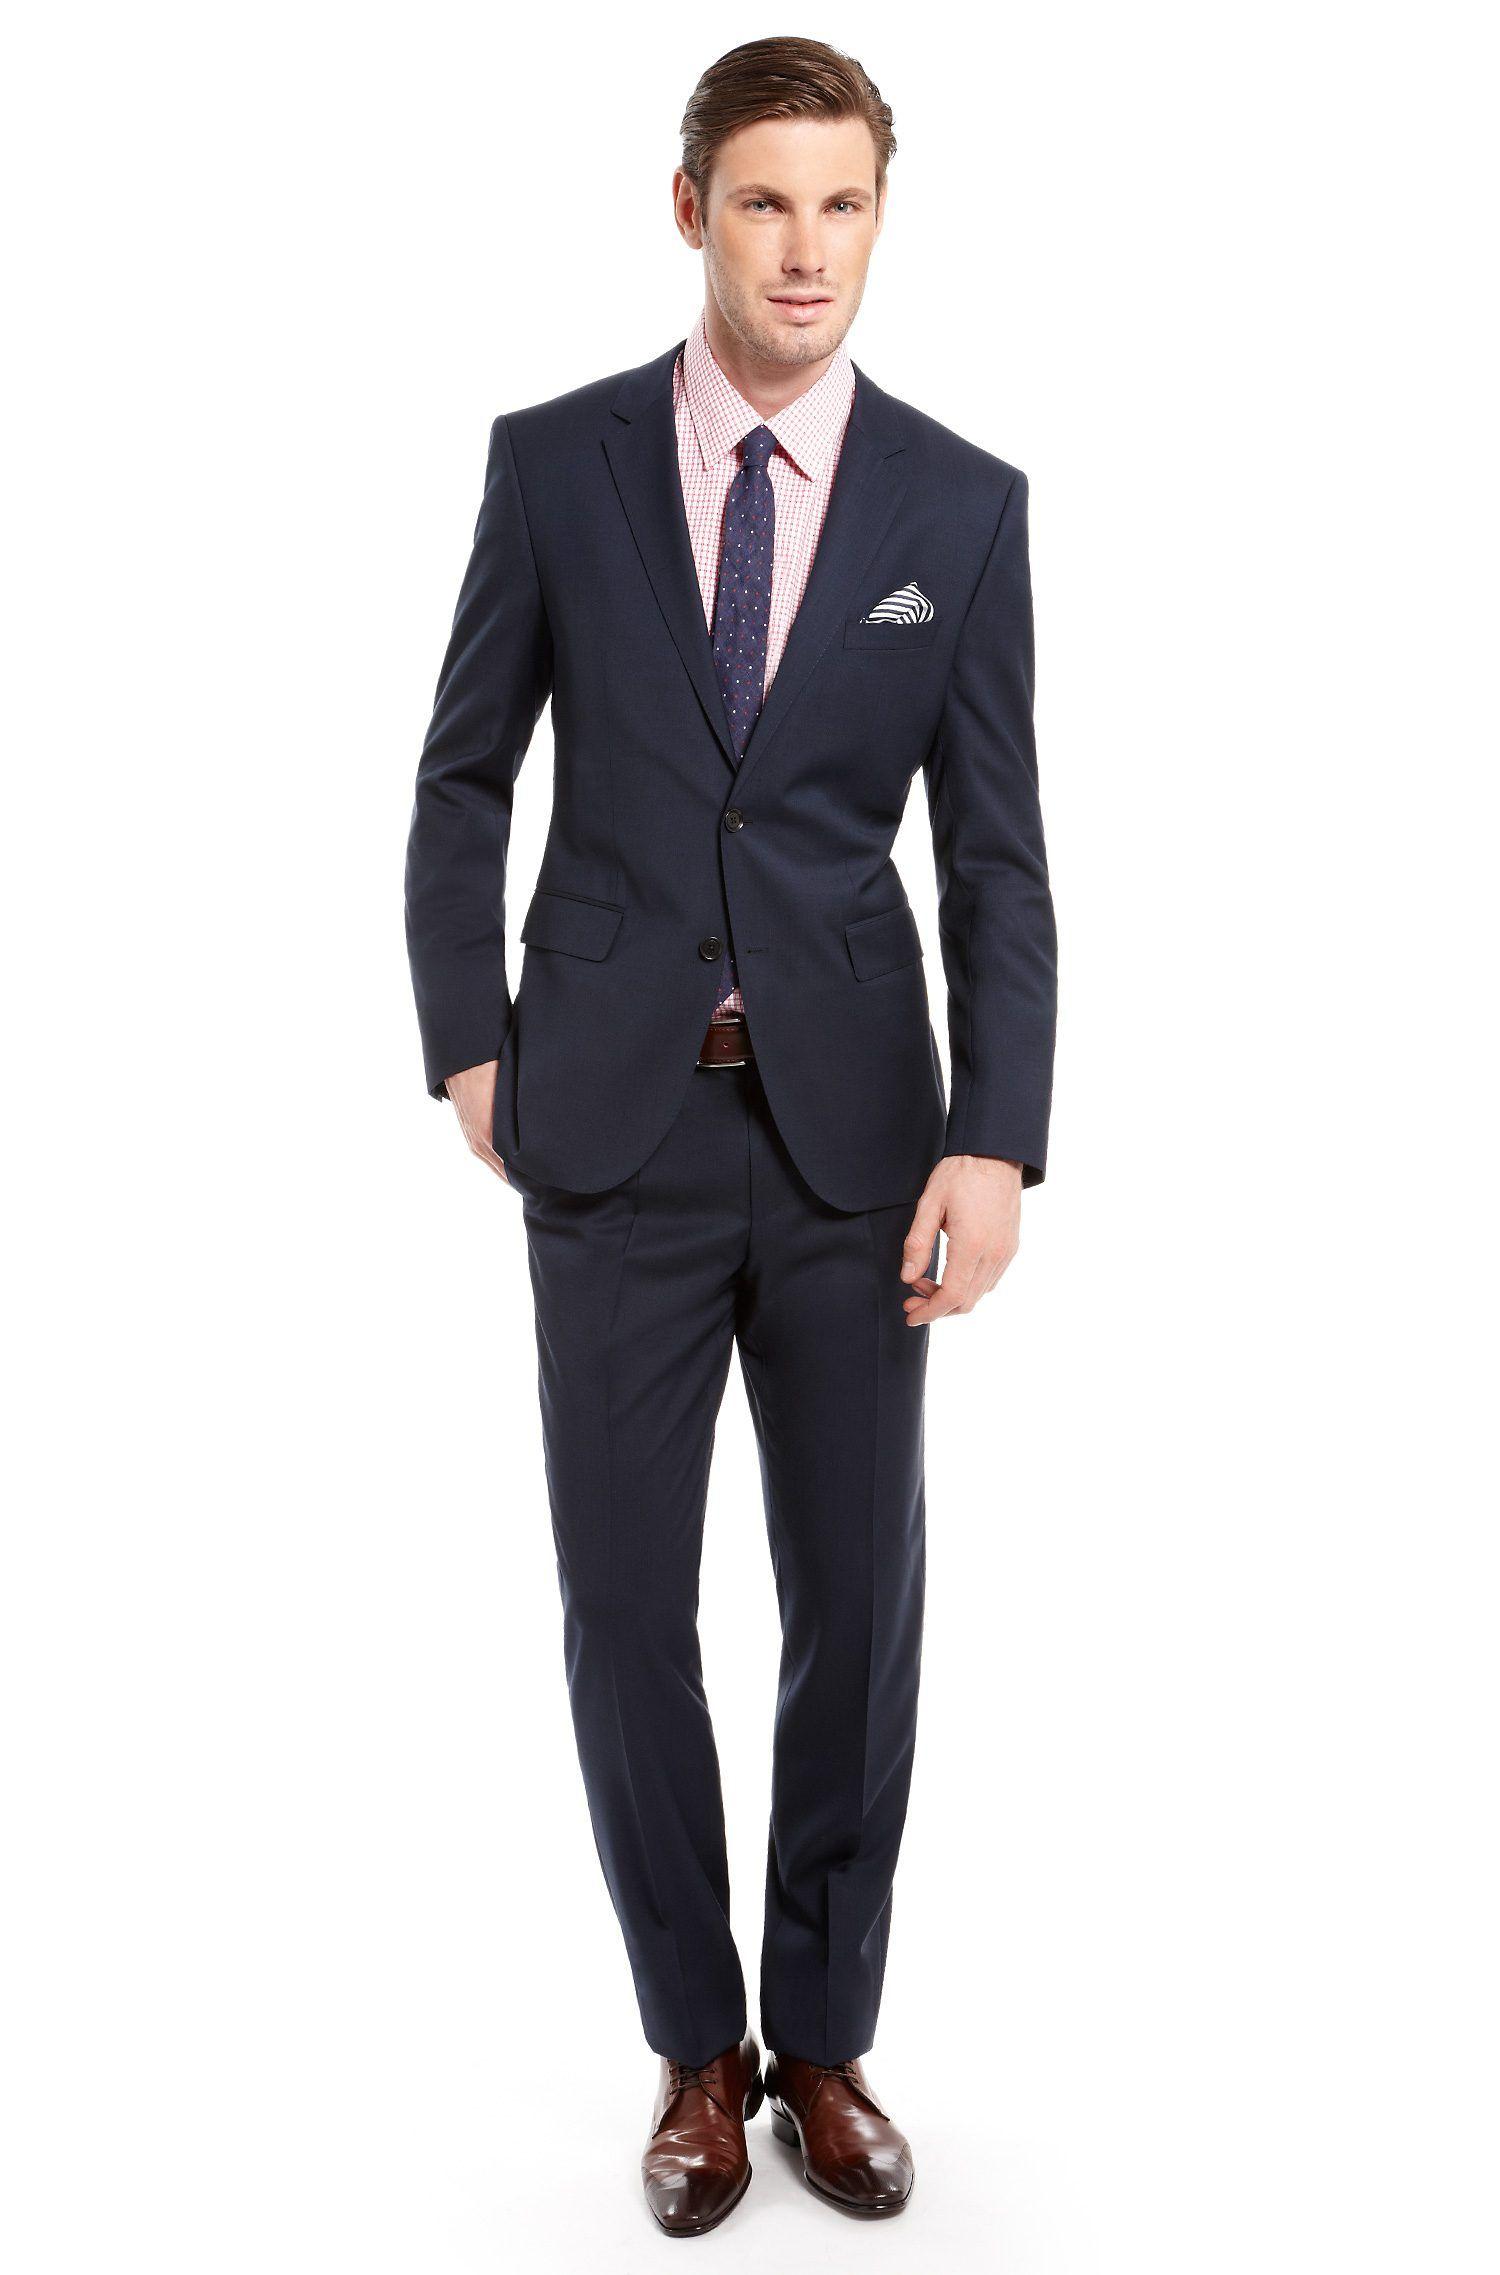 1a6ffff8 Navy Hugo Boss. BOSS Black Suit, Modern Fit Virgin Wool 'The Keys9/Shaft2'  by BOSS Black Model The Keys9/Shaft2 50241622 Navy